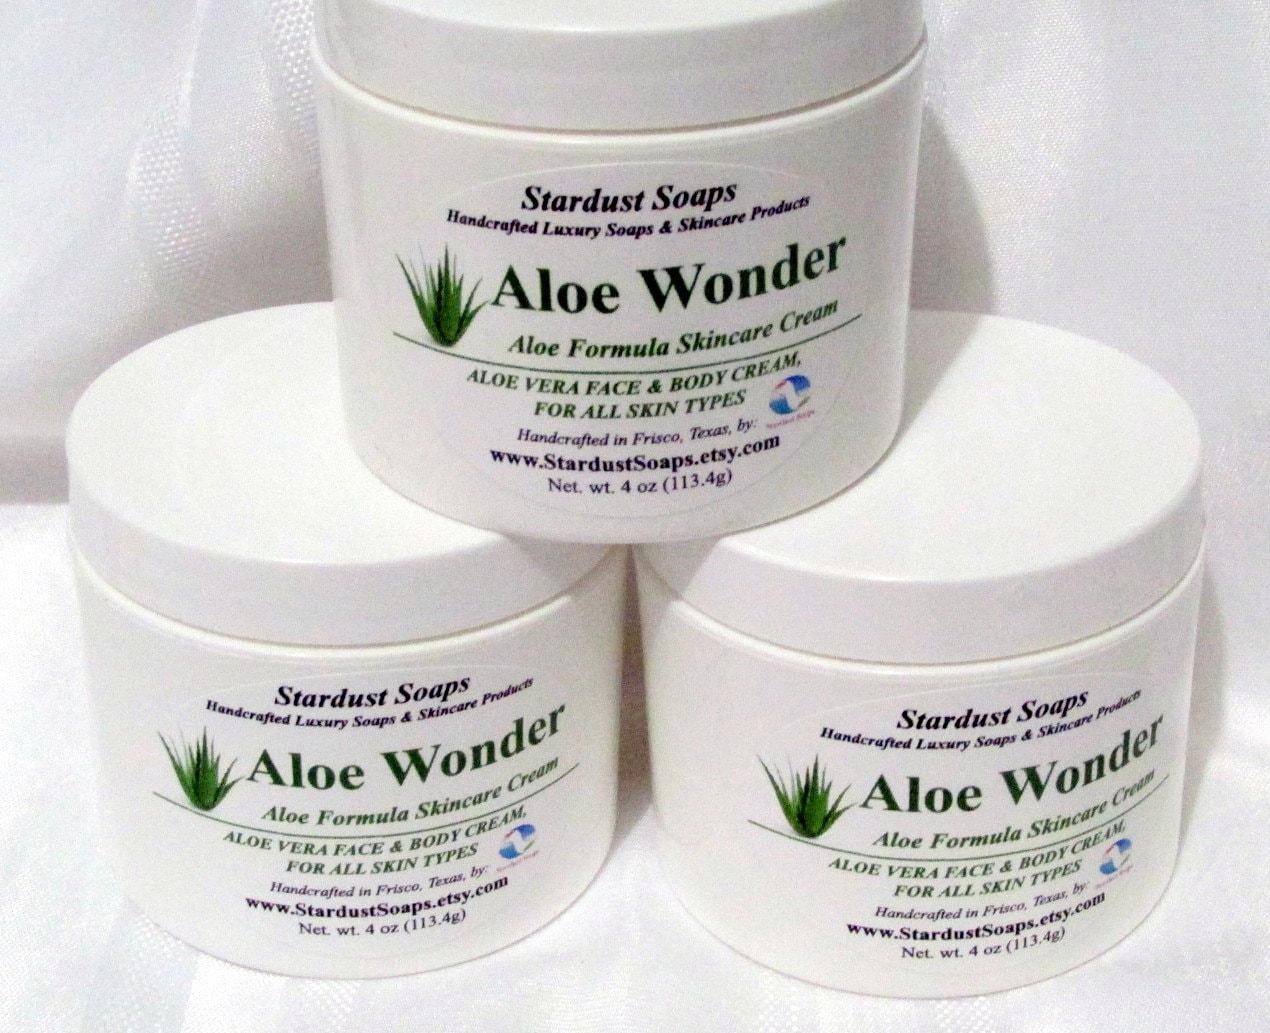 Anti Aging Night Cream Homemade free usa shipping aloe wonder cream /homemade skin care